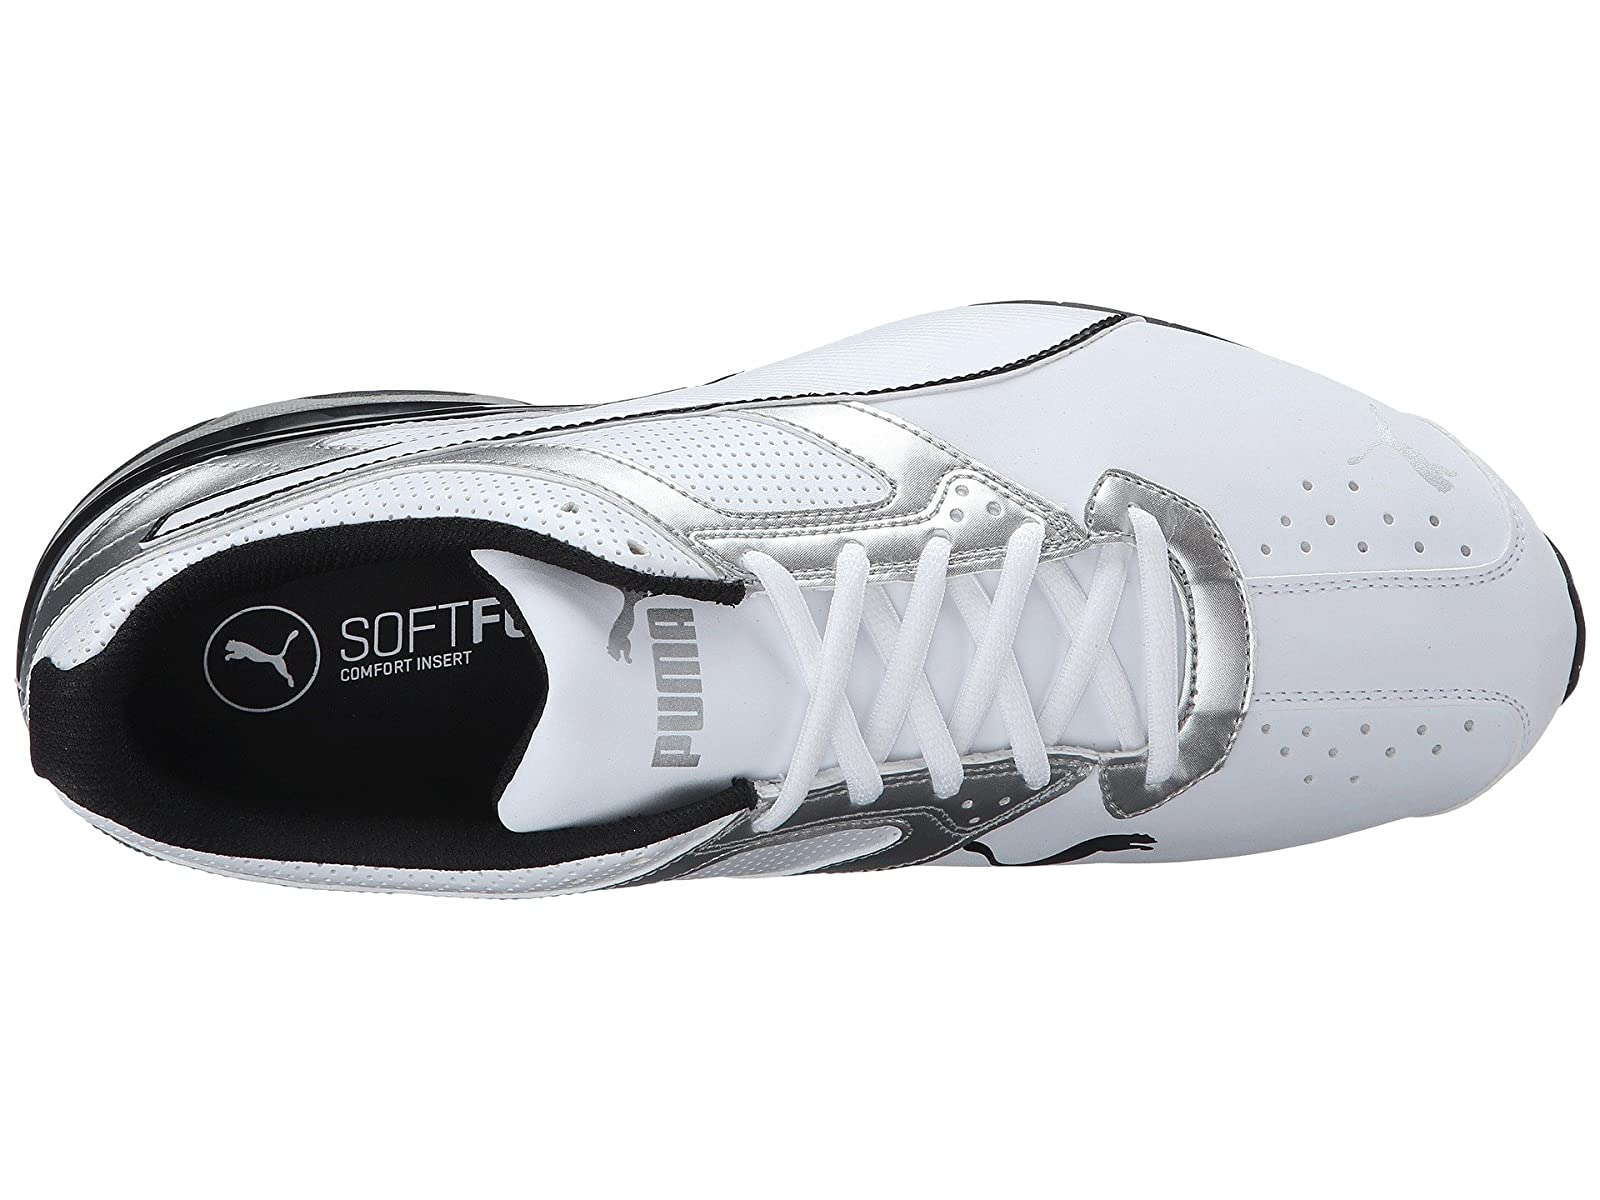 Men-039-s-Scarpe-Da-Ginnastica-amp-Athletic-Shoes-Puma-Tazon-6-FM miniatura 24